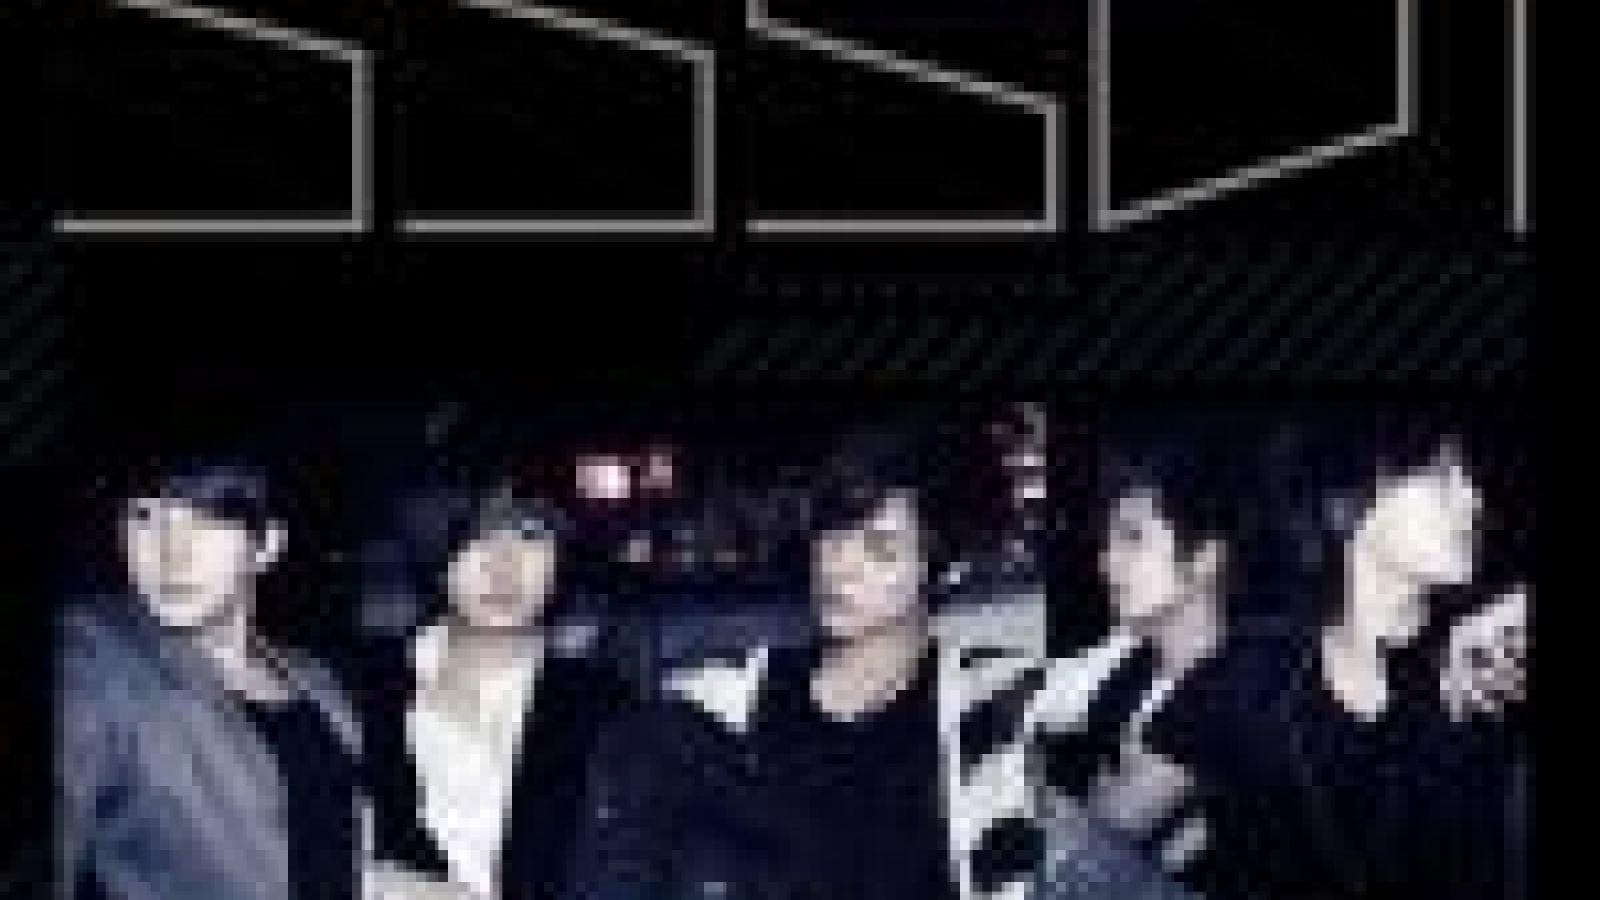 Novo mini-álbum coreano & kit especial japonês de SS501 © KoME